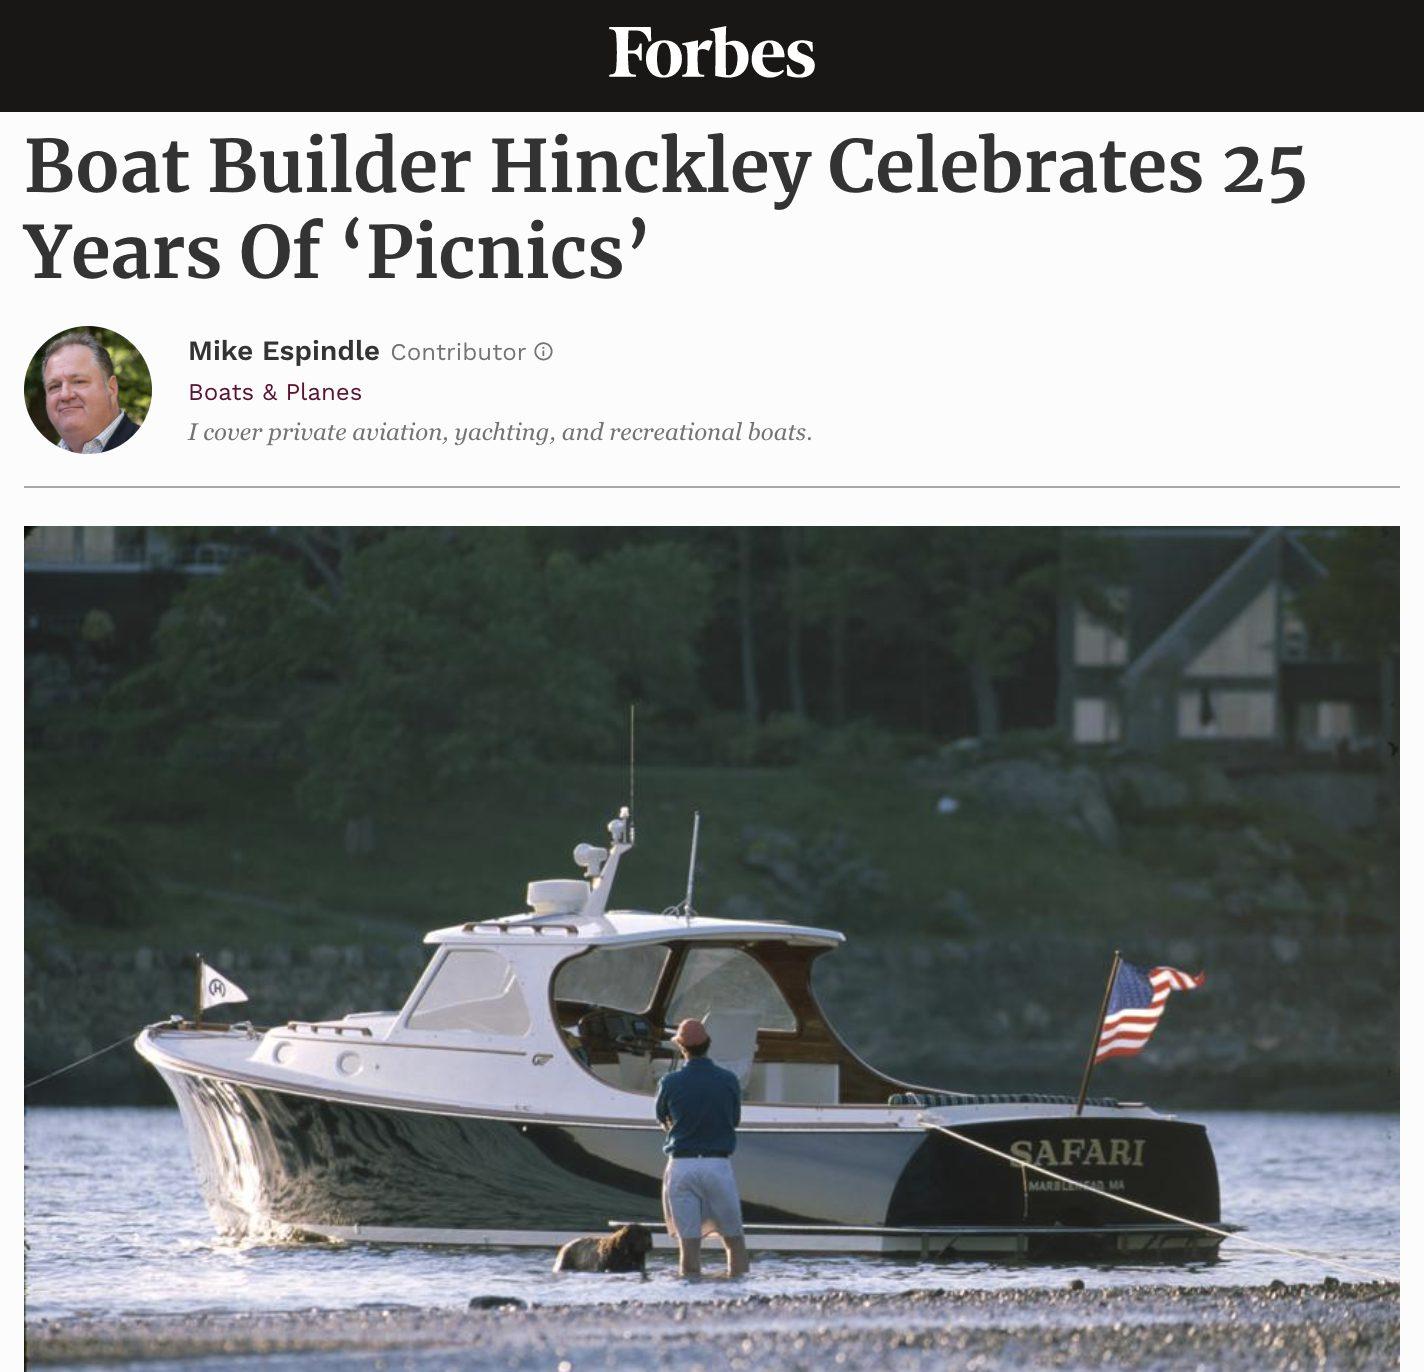 Boat Builder Hinckley Celebrates 25 Years Of 'Picnics'